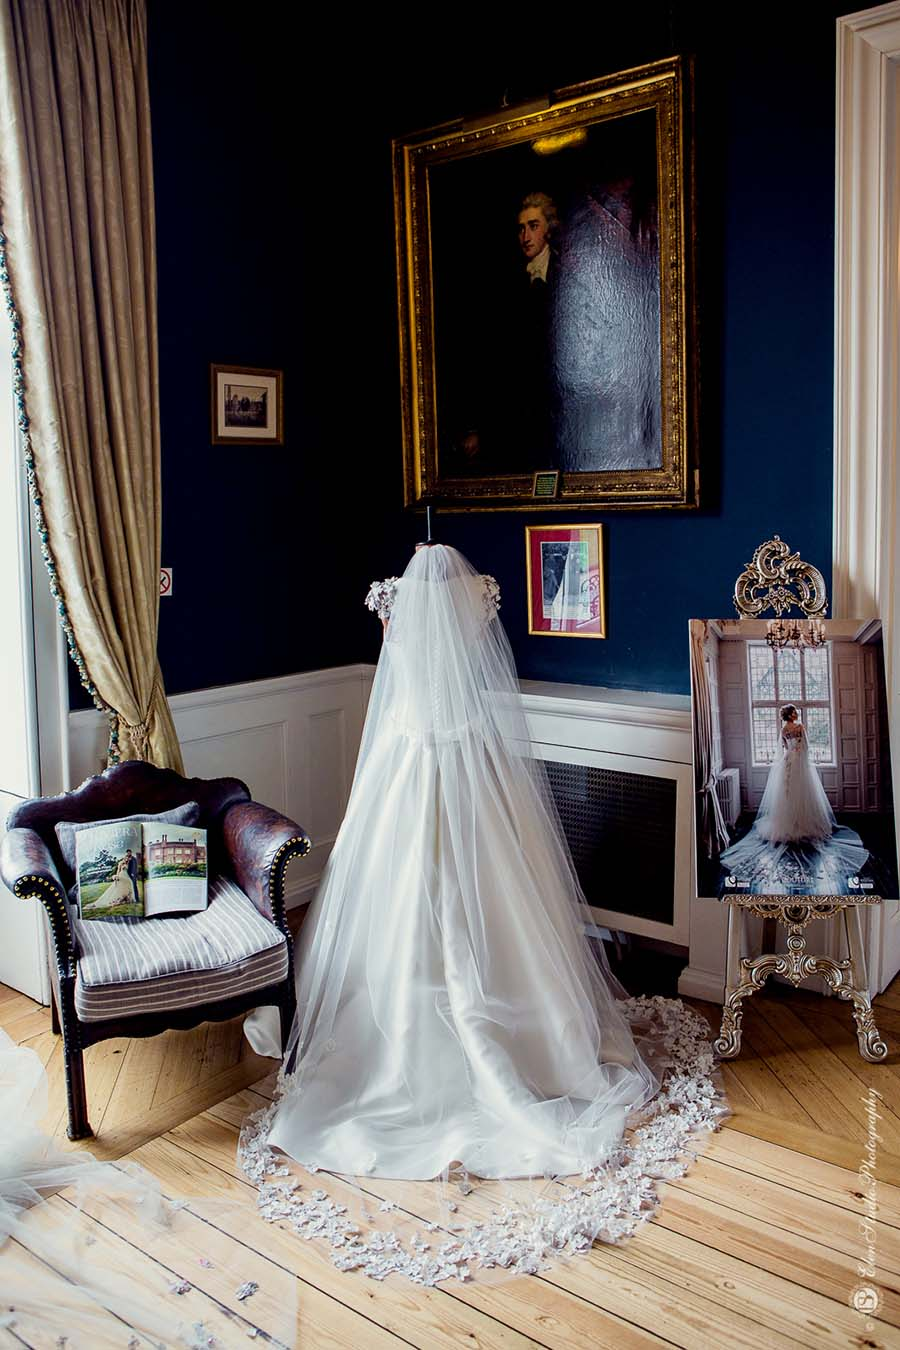 Hodsock Priory Wedding Fair, Spring 2019